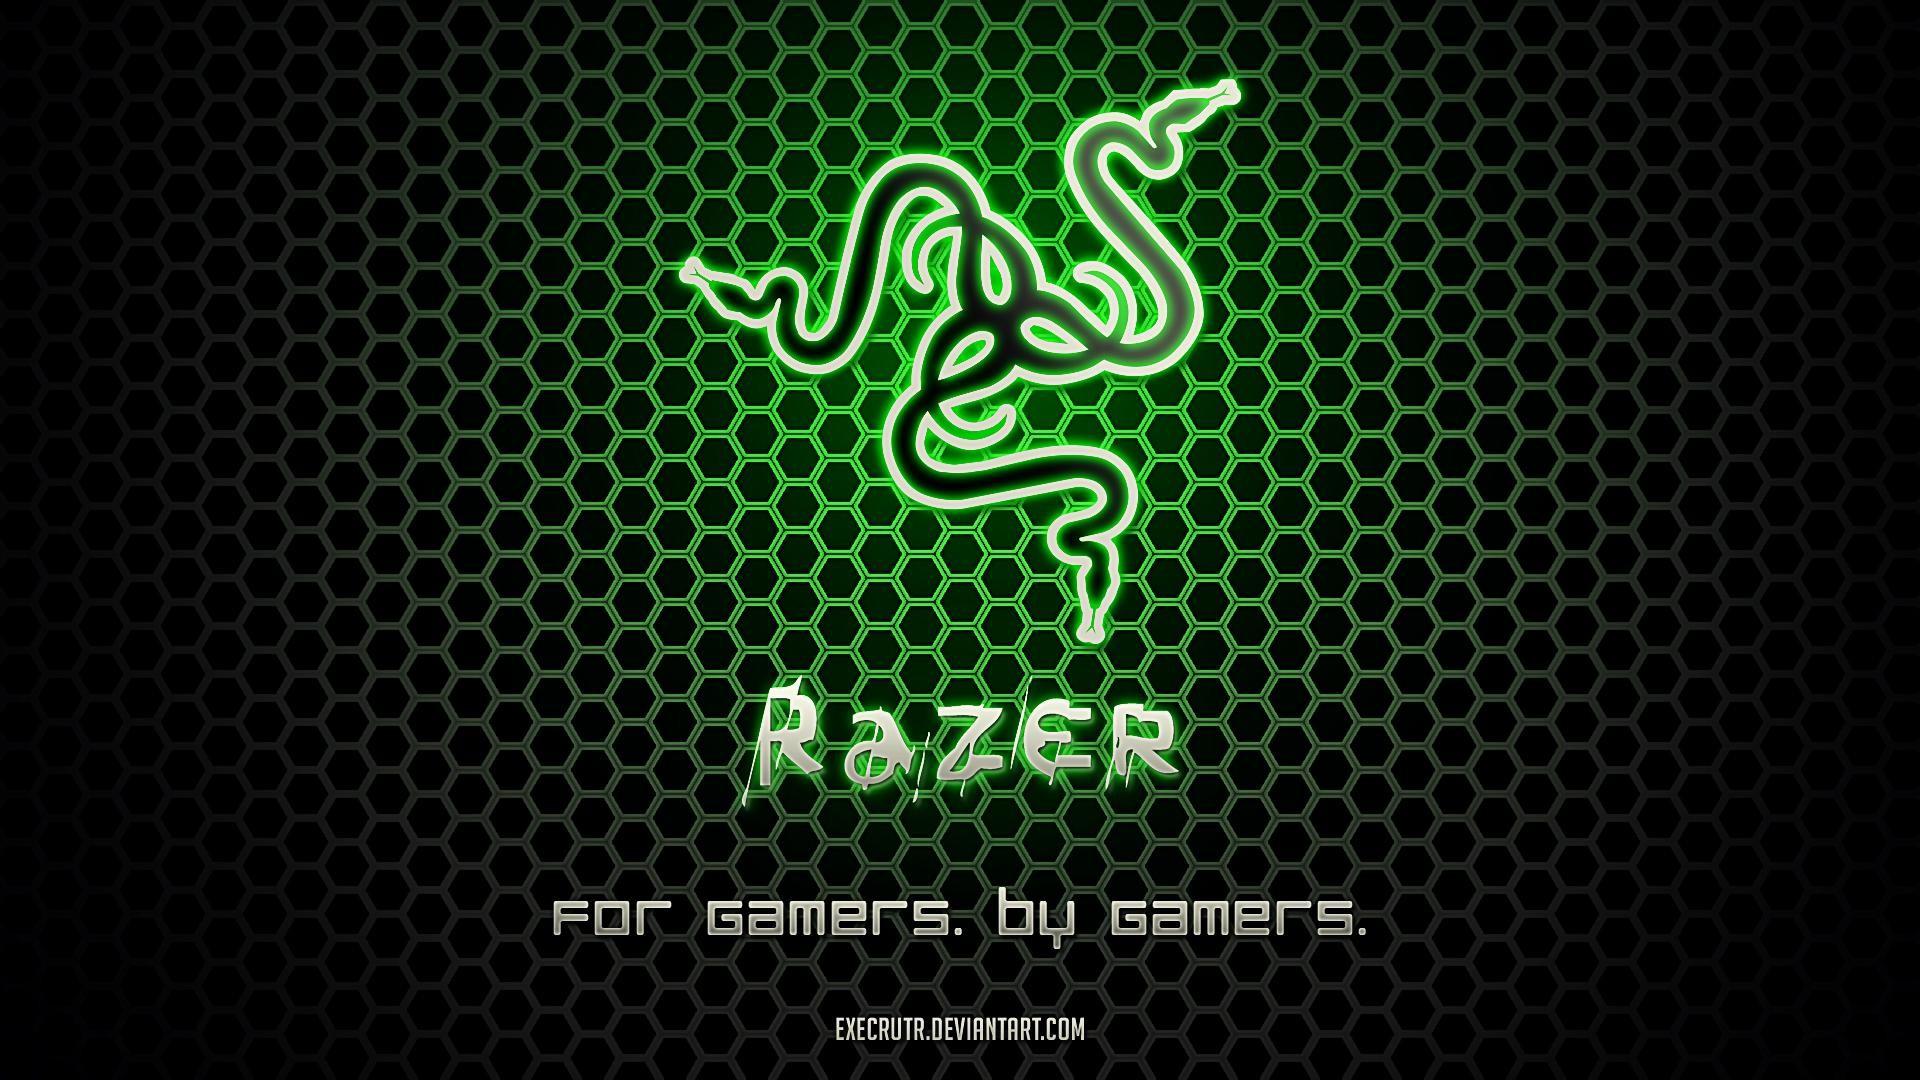 … razer logo wallpapers hd backgrounds wallpapersin4k net …